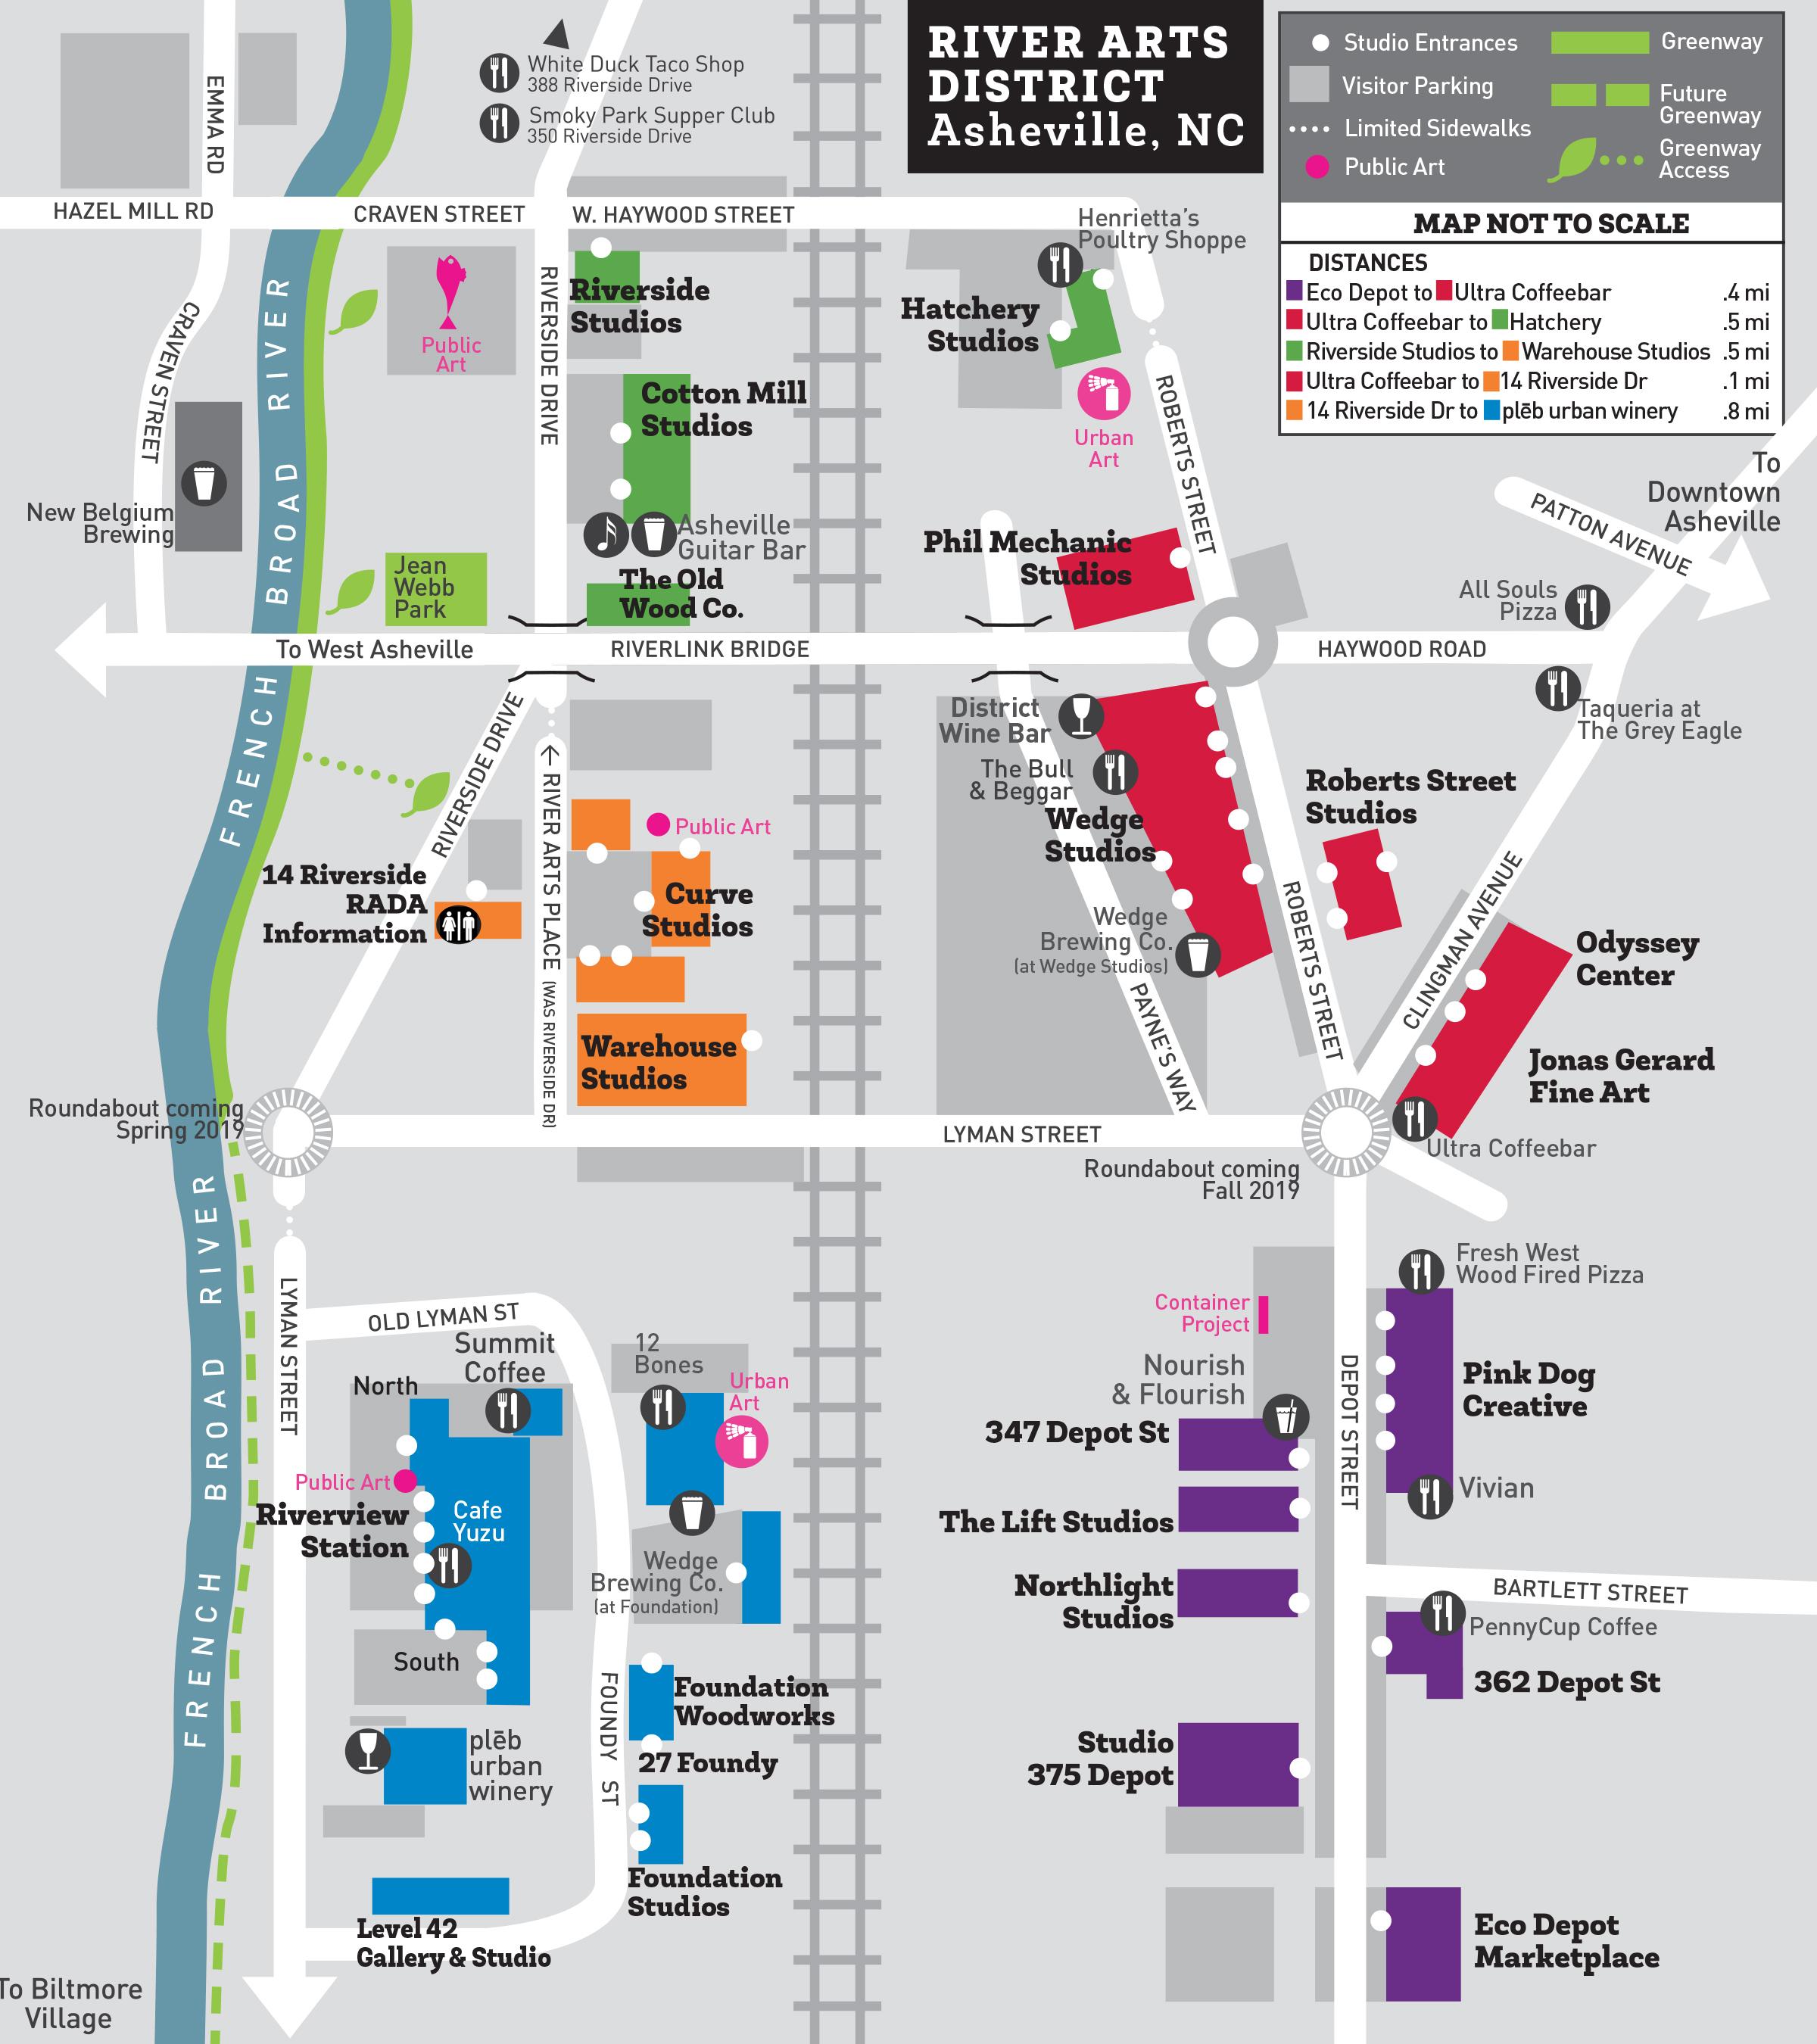 River Arts District Asheville Studio Map